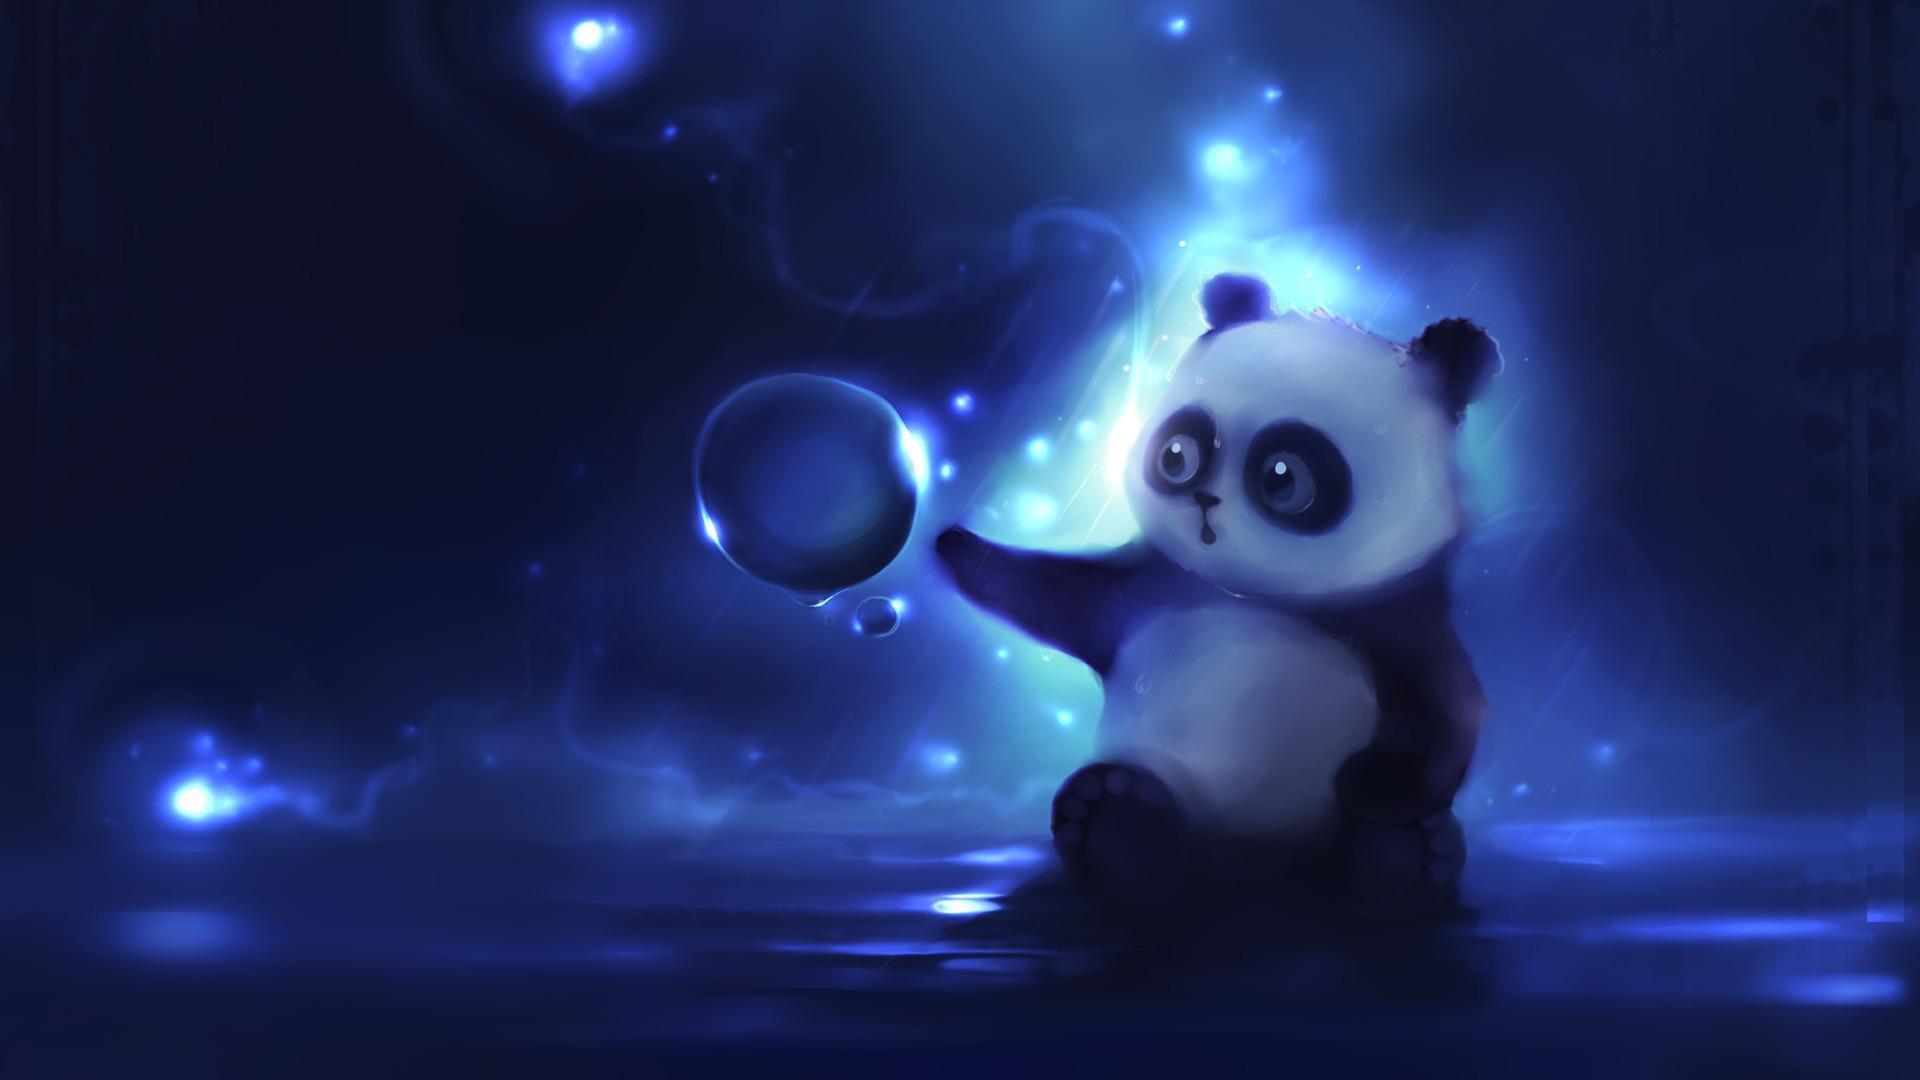 cute animated panda download beautiful animated desktop wallpapers 1920x1080